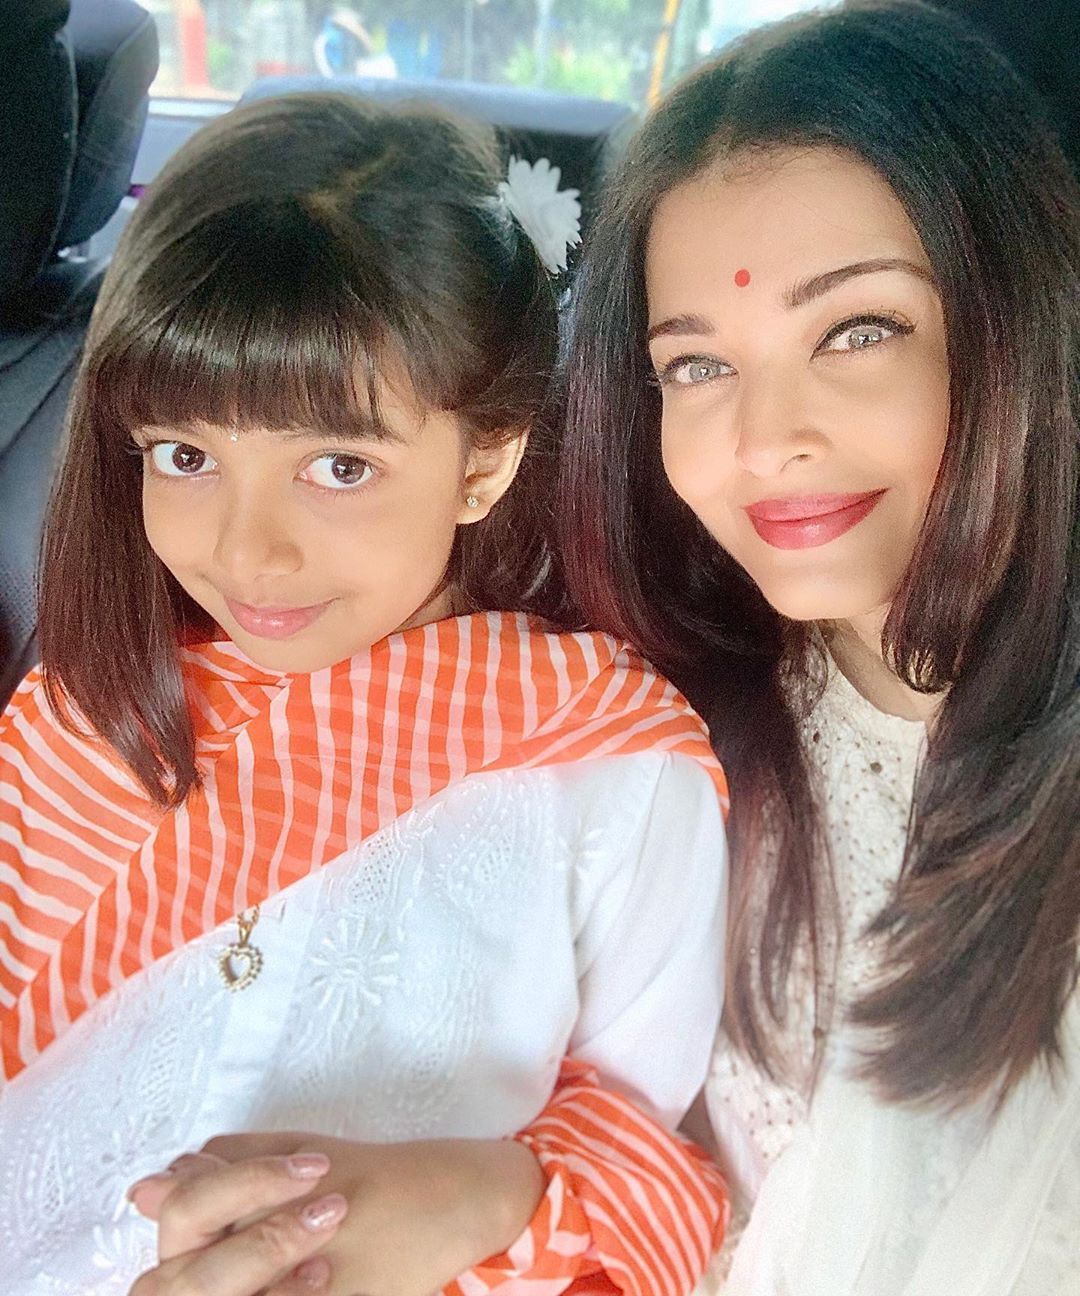 Aishwaryaraibachchan On Instagram Happy Dussehra And Vijaya Dashami To All Much Warmth Love And Aishwarya Rai Aishwarya Rai Bachchan Bollywood Actress